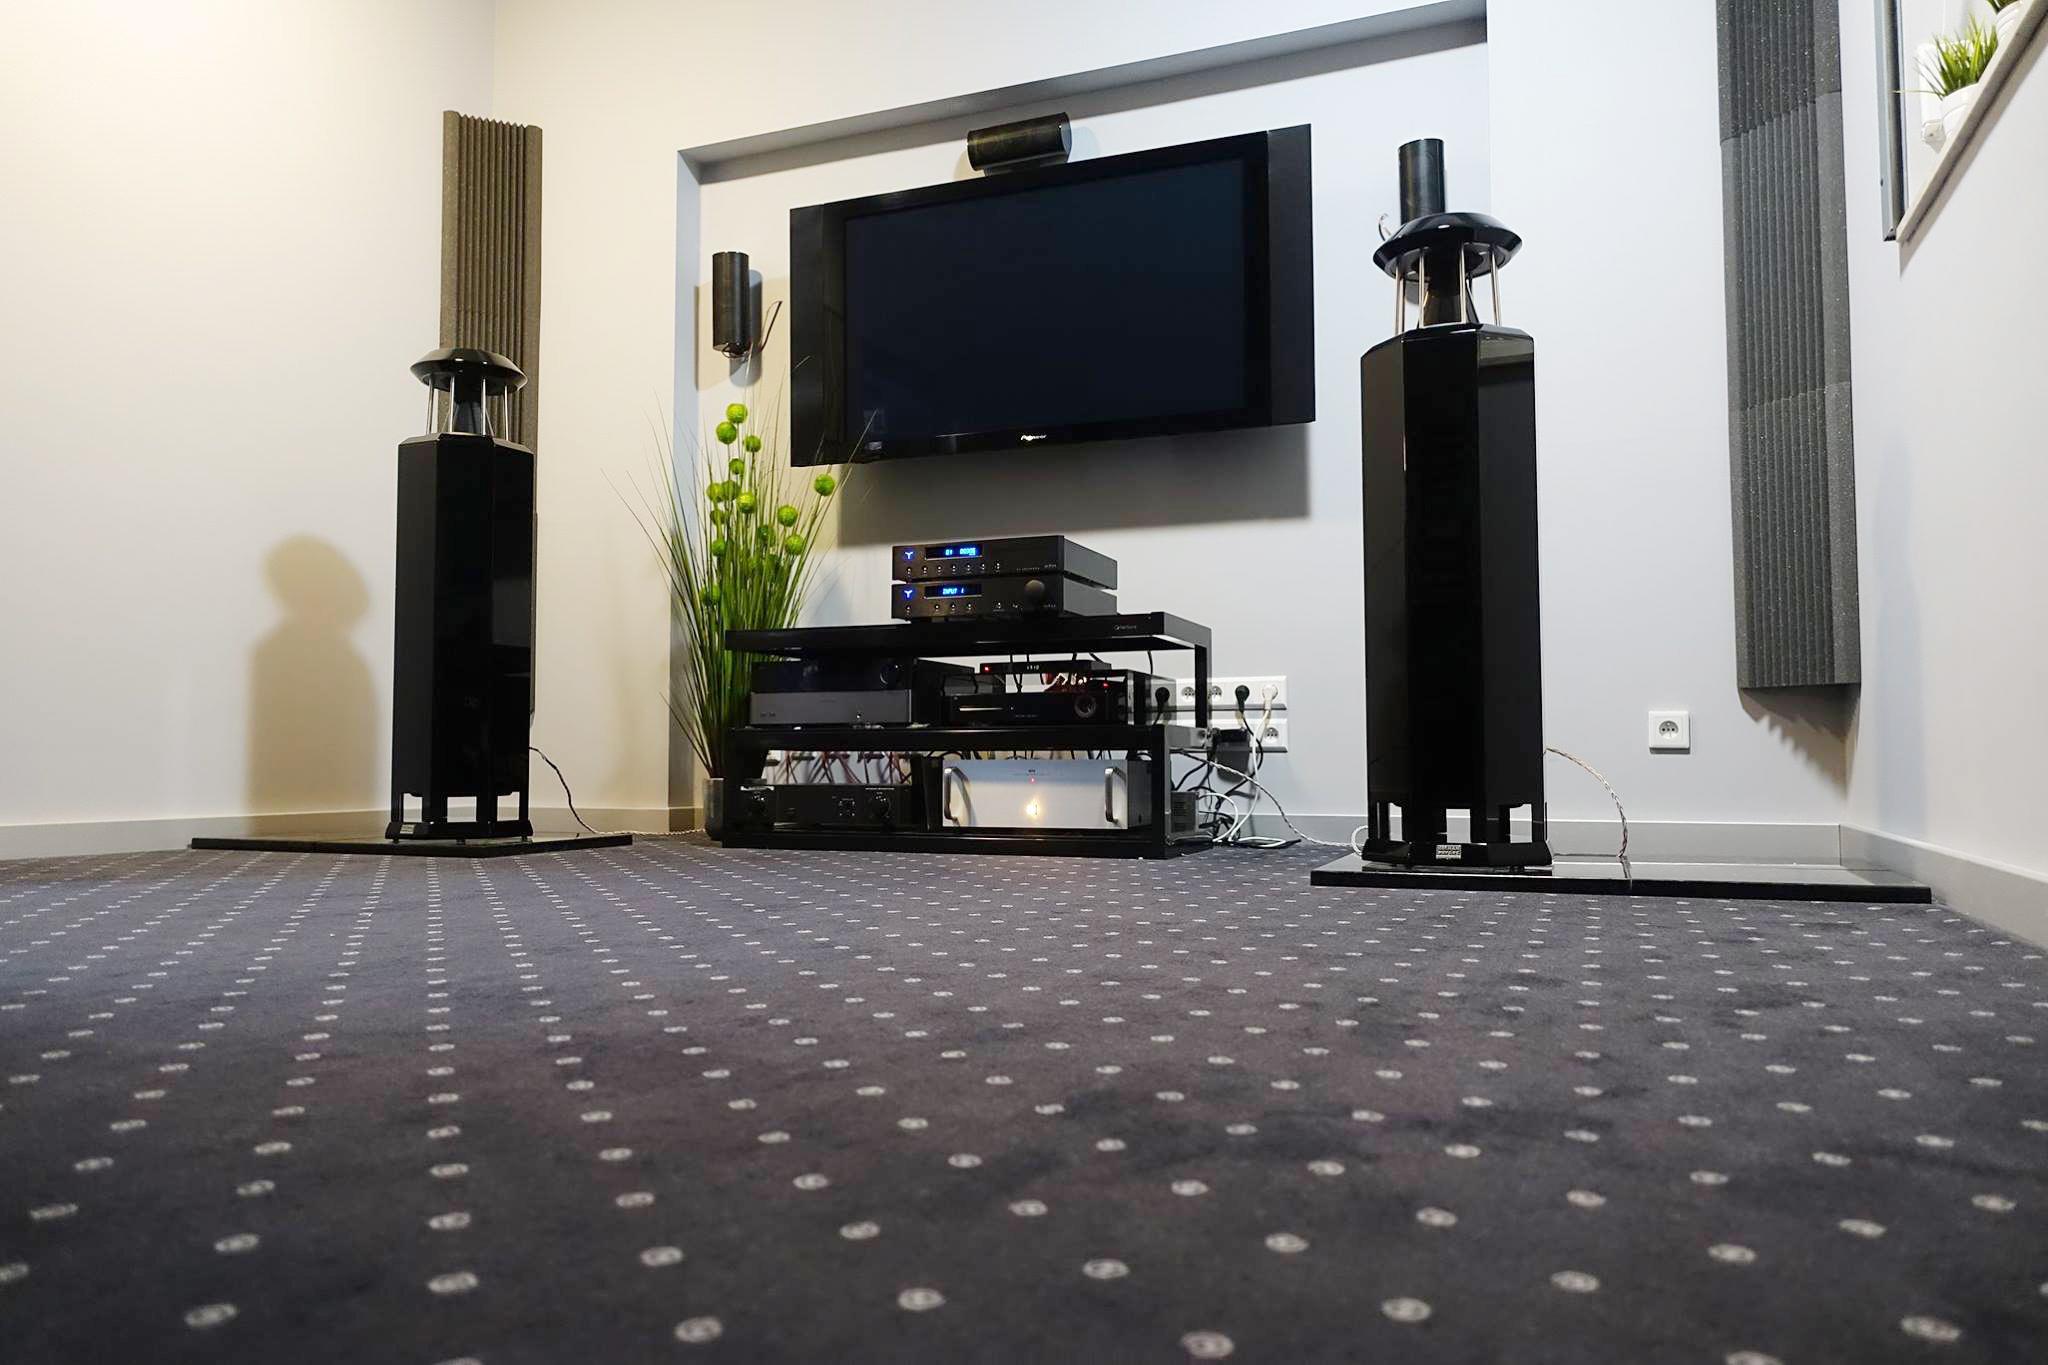 HRS-130 loudspeakers | Audio Trendt Showroom, Poland, 2015